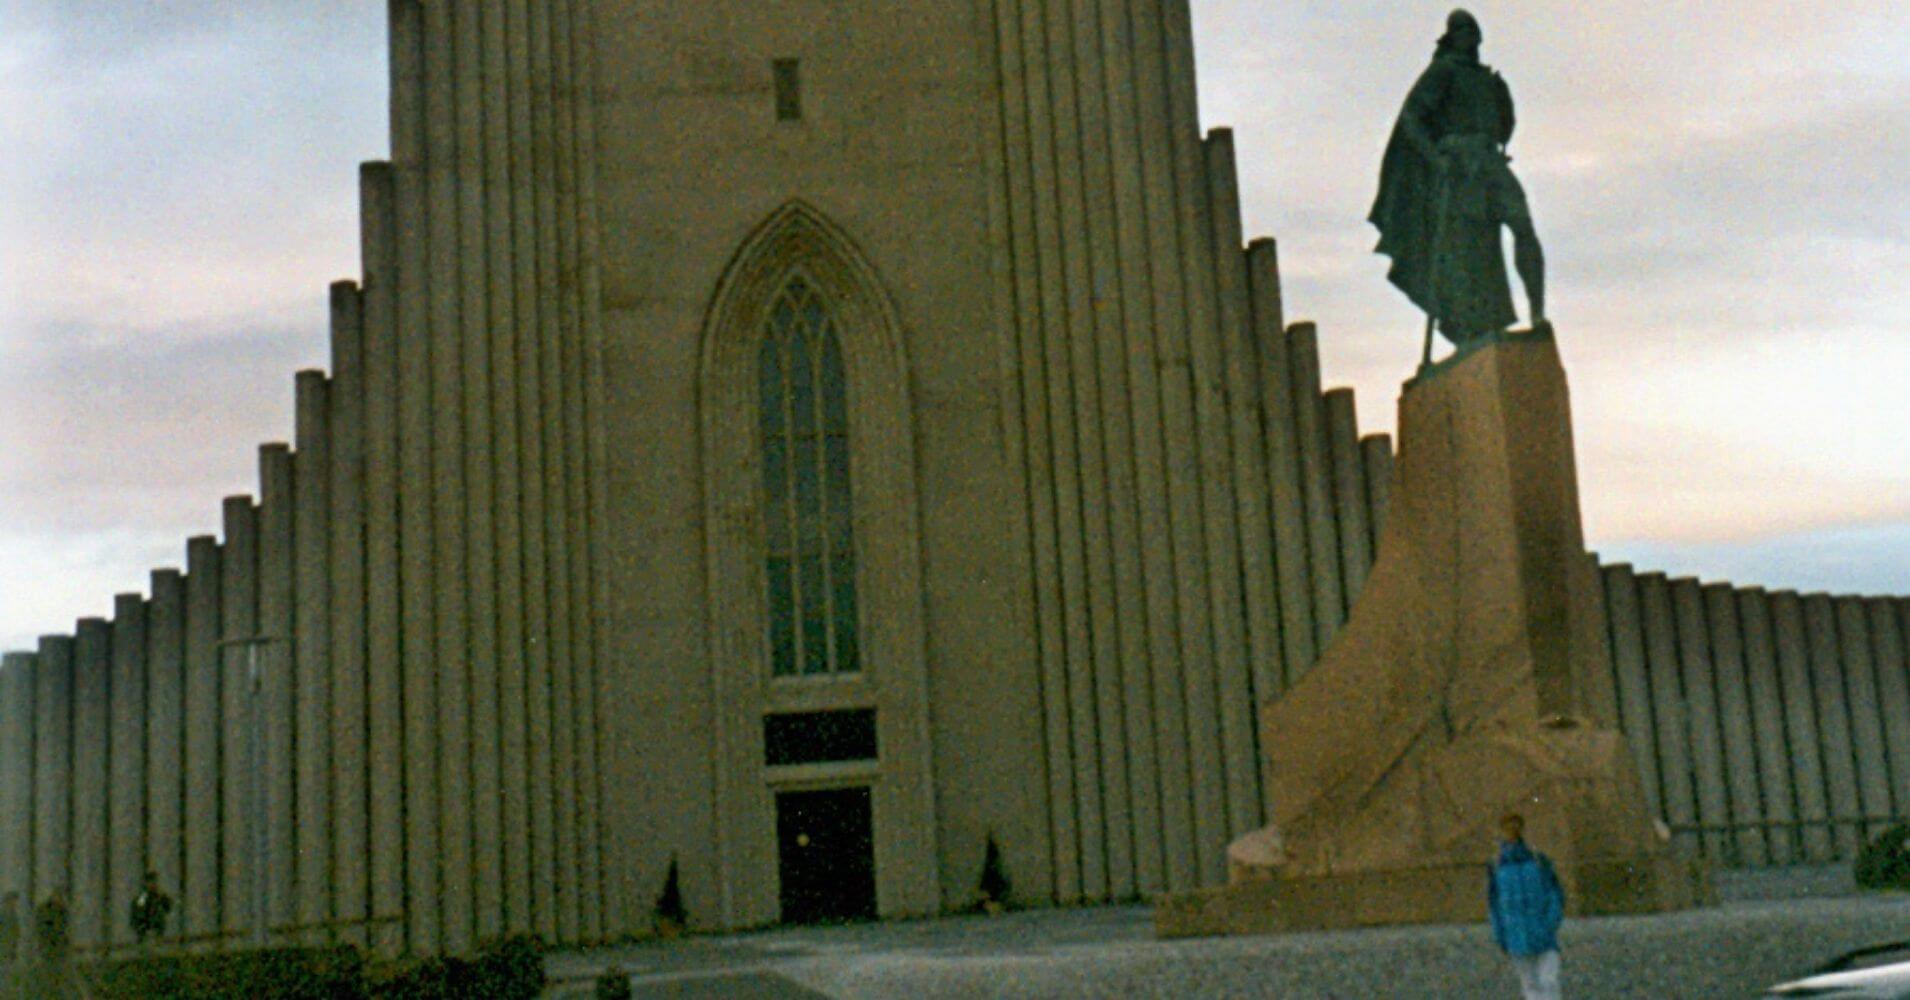 La Hallgrímskirkja, Catedral de Reyjkiavík. Islandia.